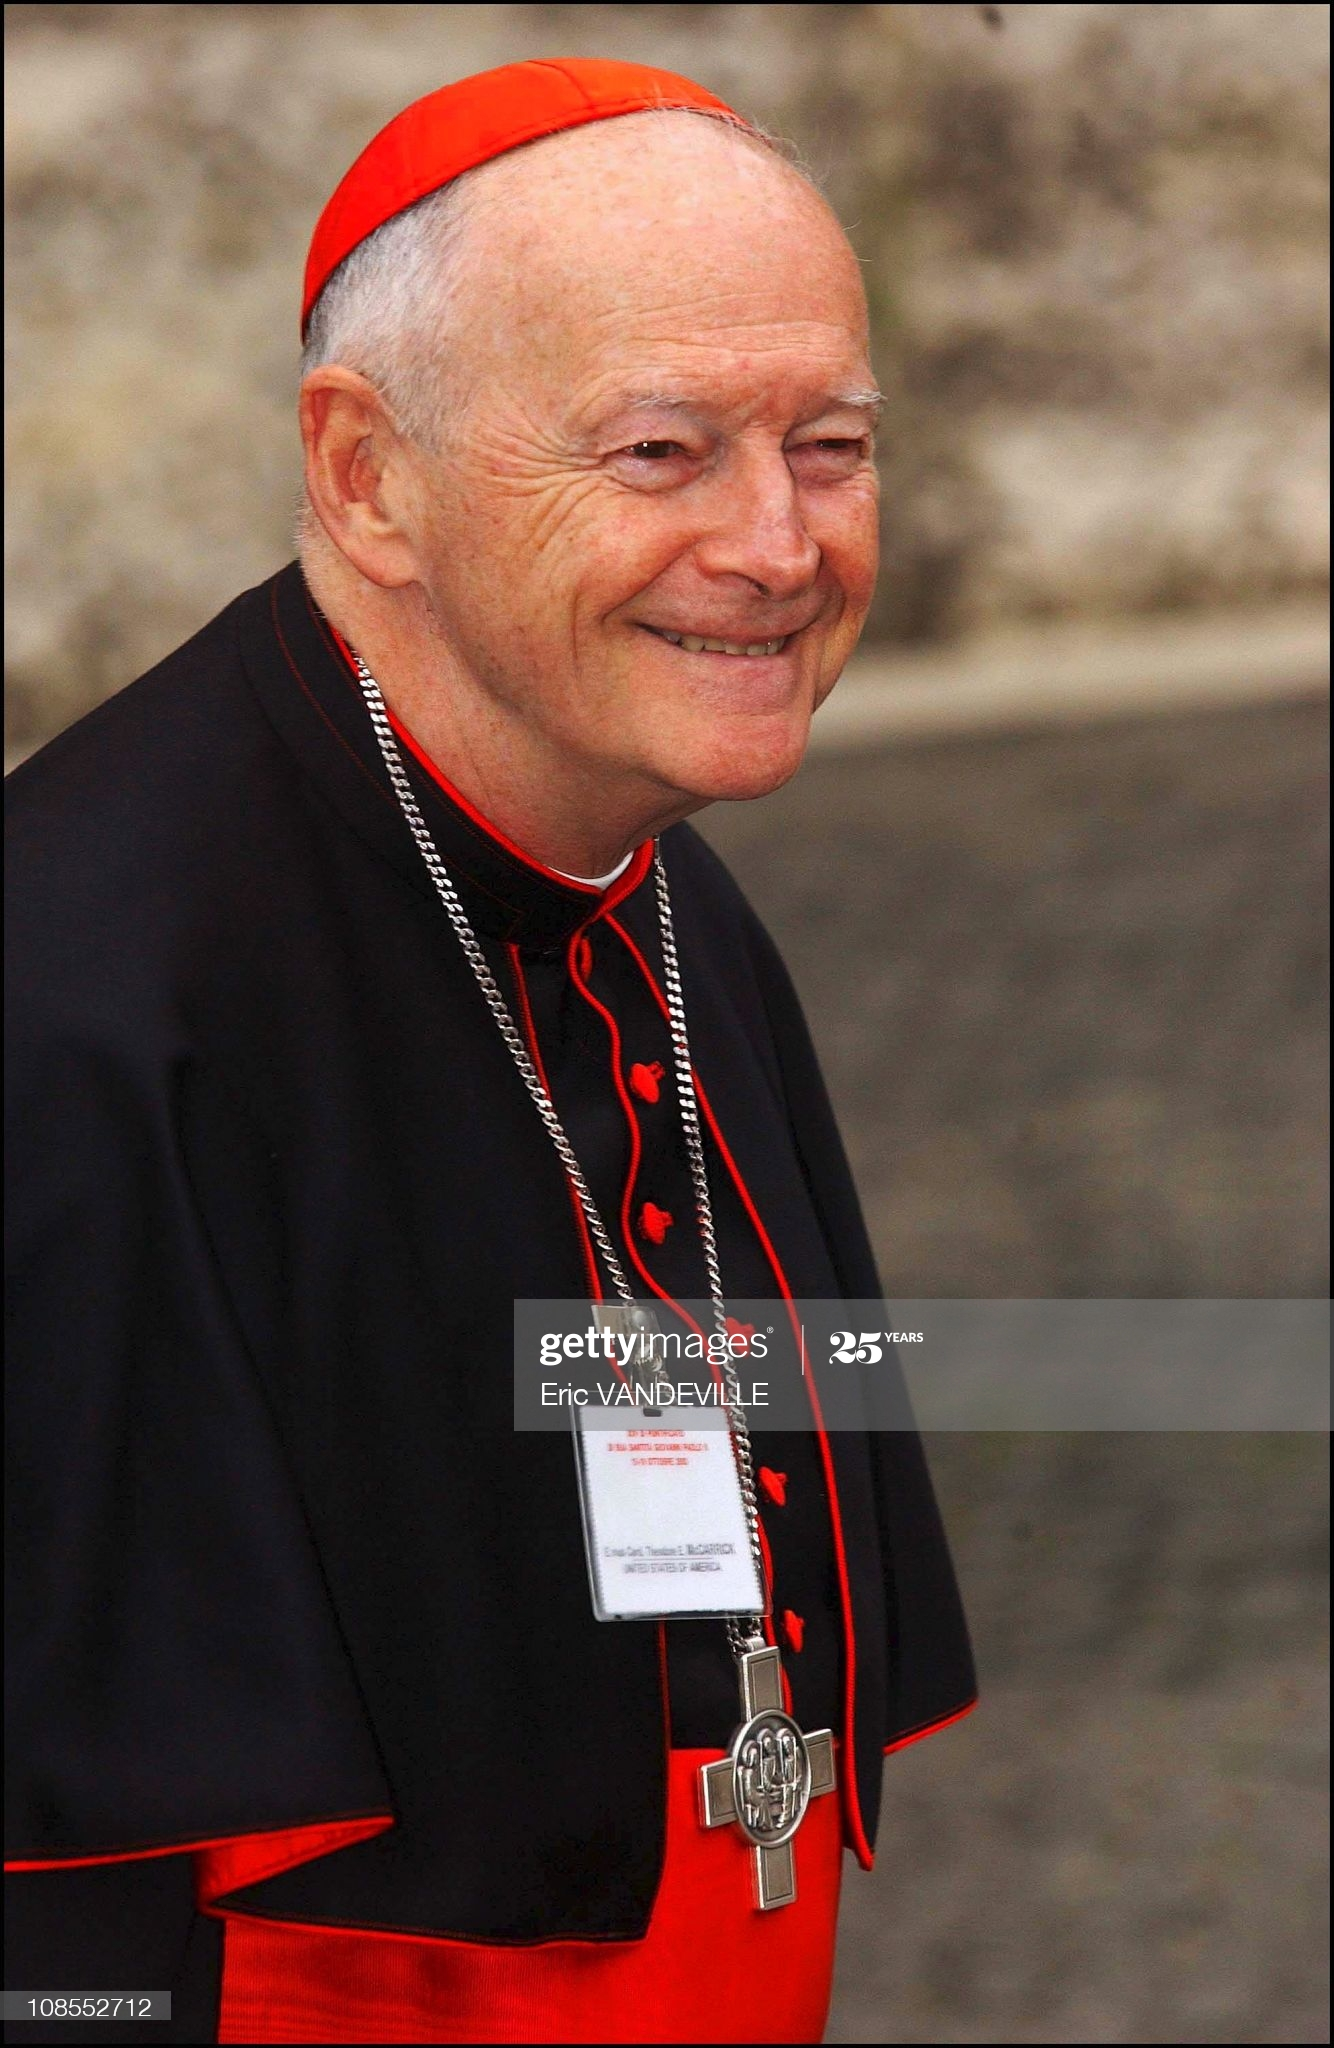 Vaticano Revela cómo un abusador  llegó a ser Cardenal en EEUU